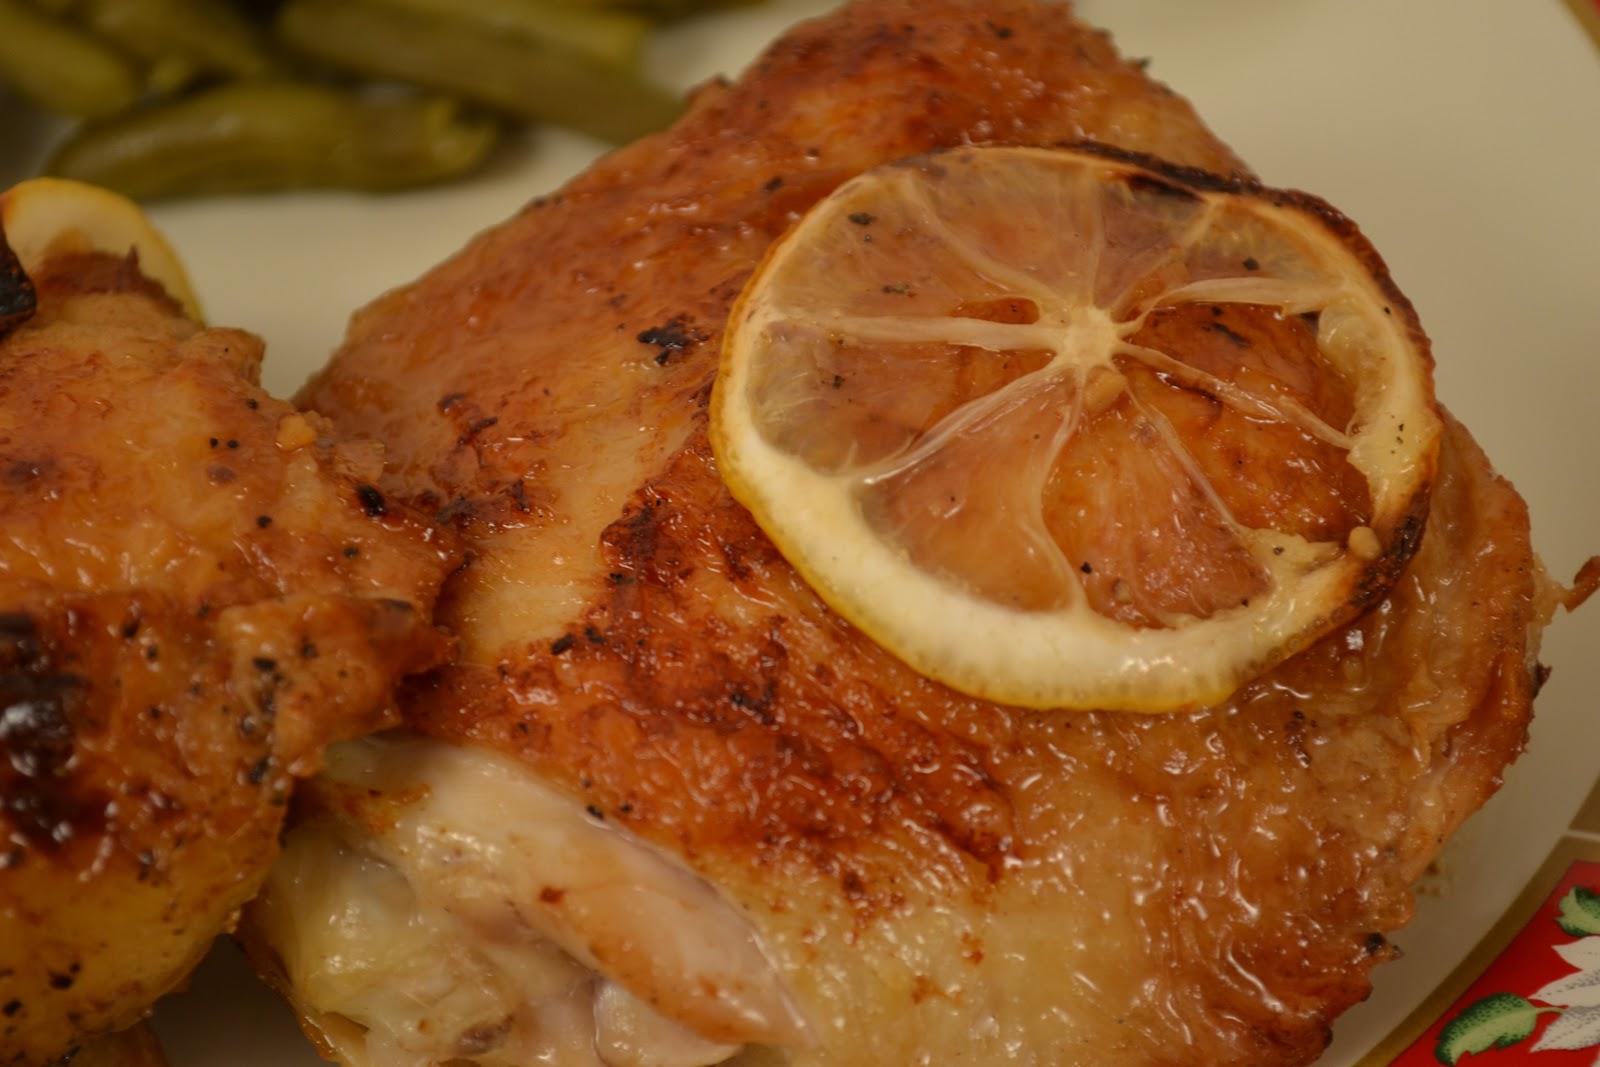 Taste of Alaska: Roasted Chicken Thighs with Lemon and Oregano